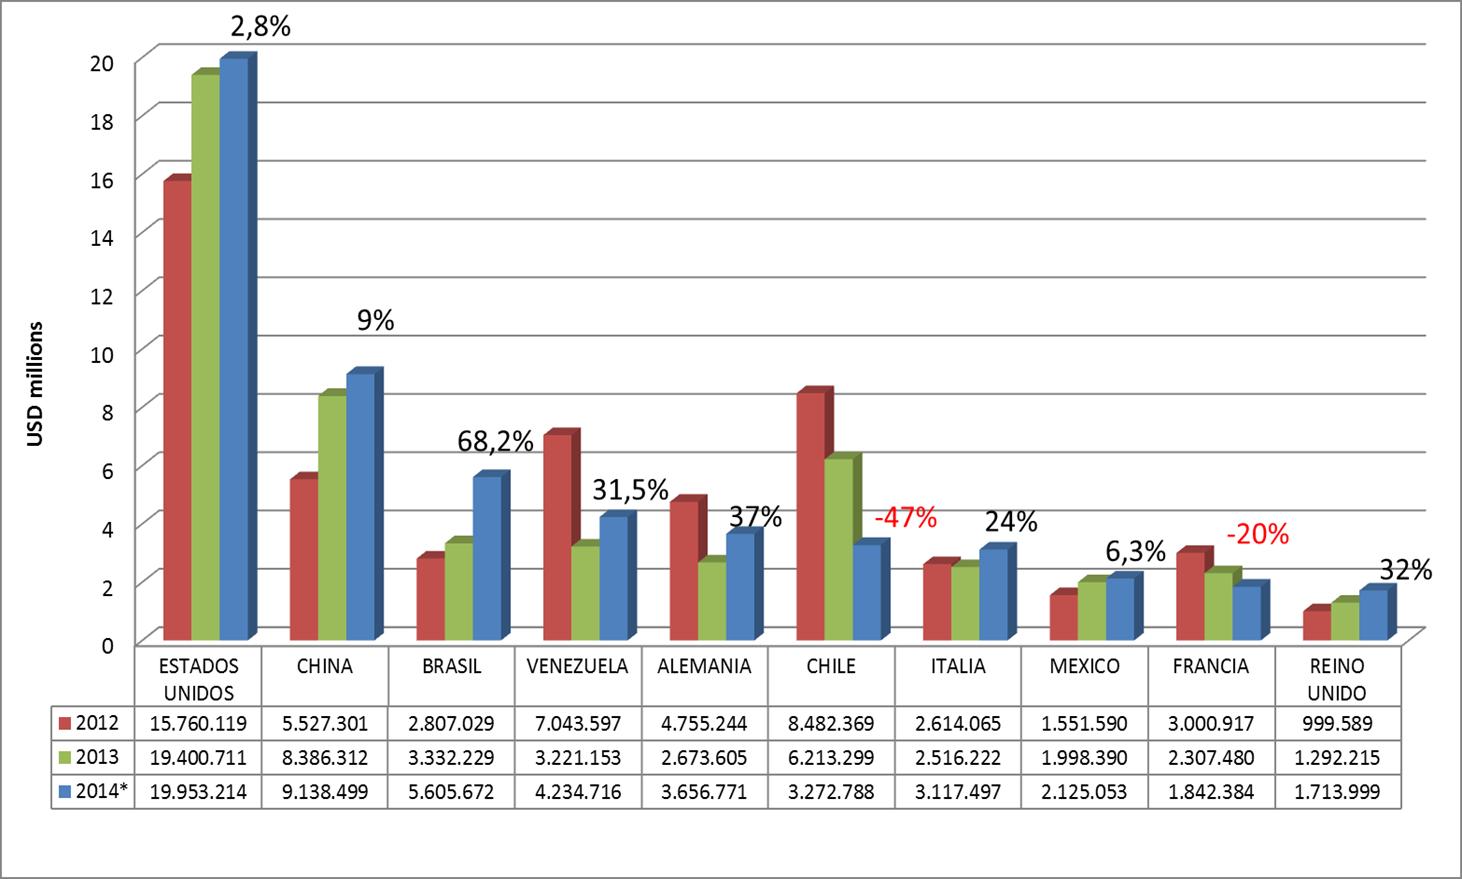 Exportaciones de productos de madera por Pais destino 2014